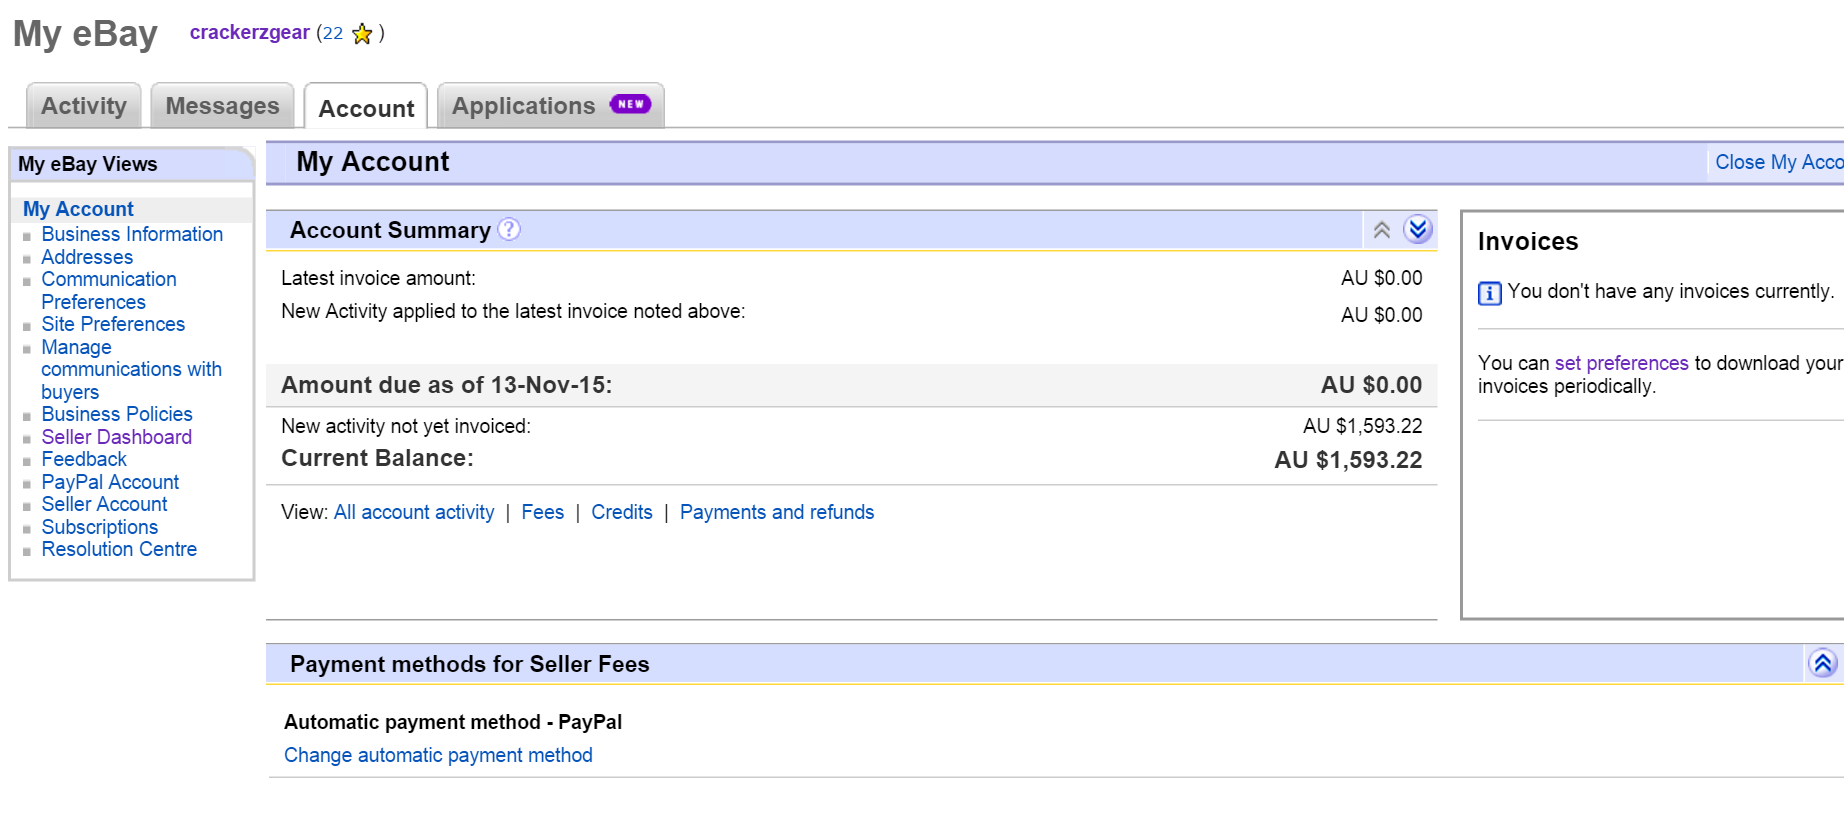 Invoice Fee For 1 593 22 The Ebay Community